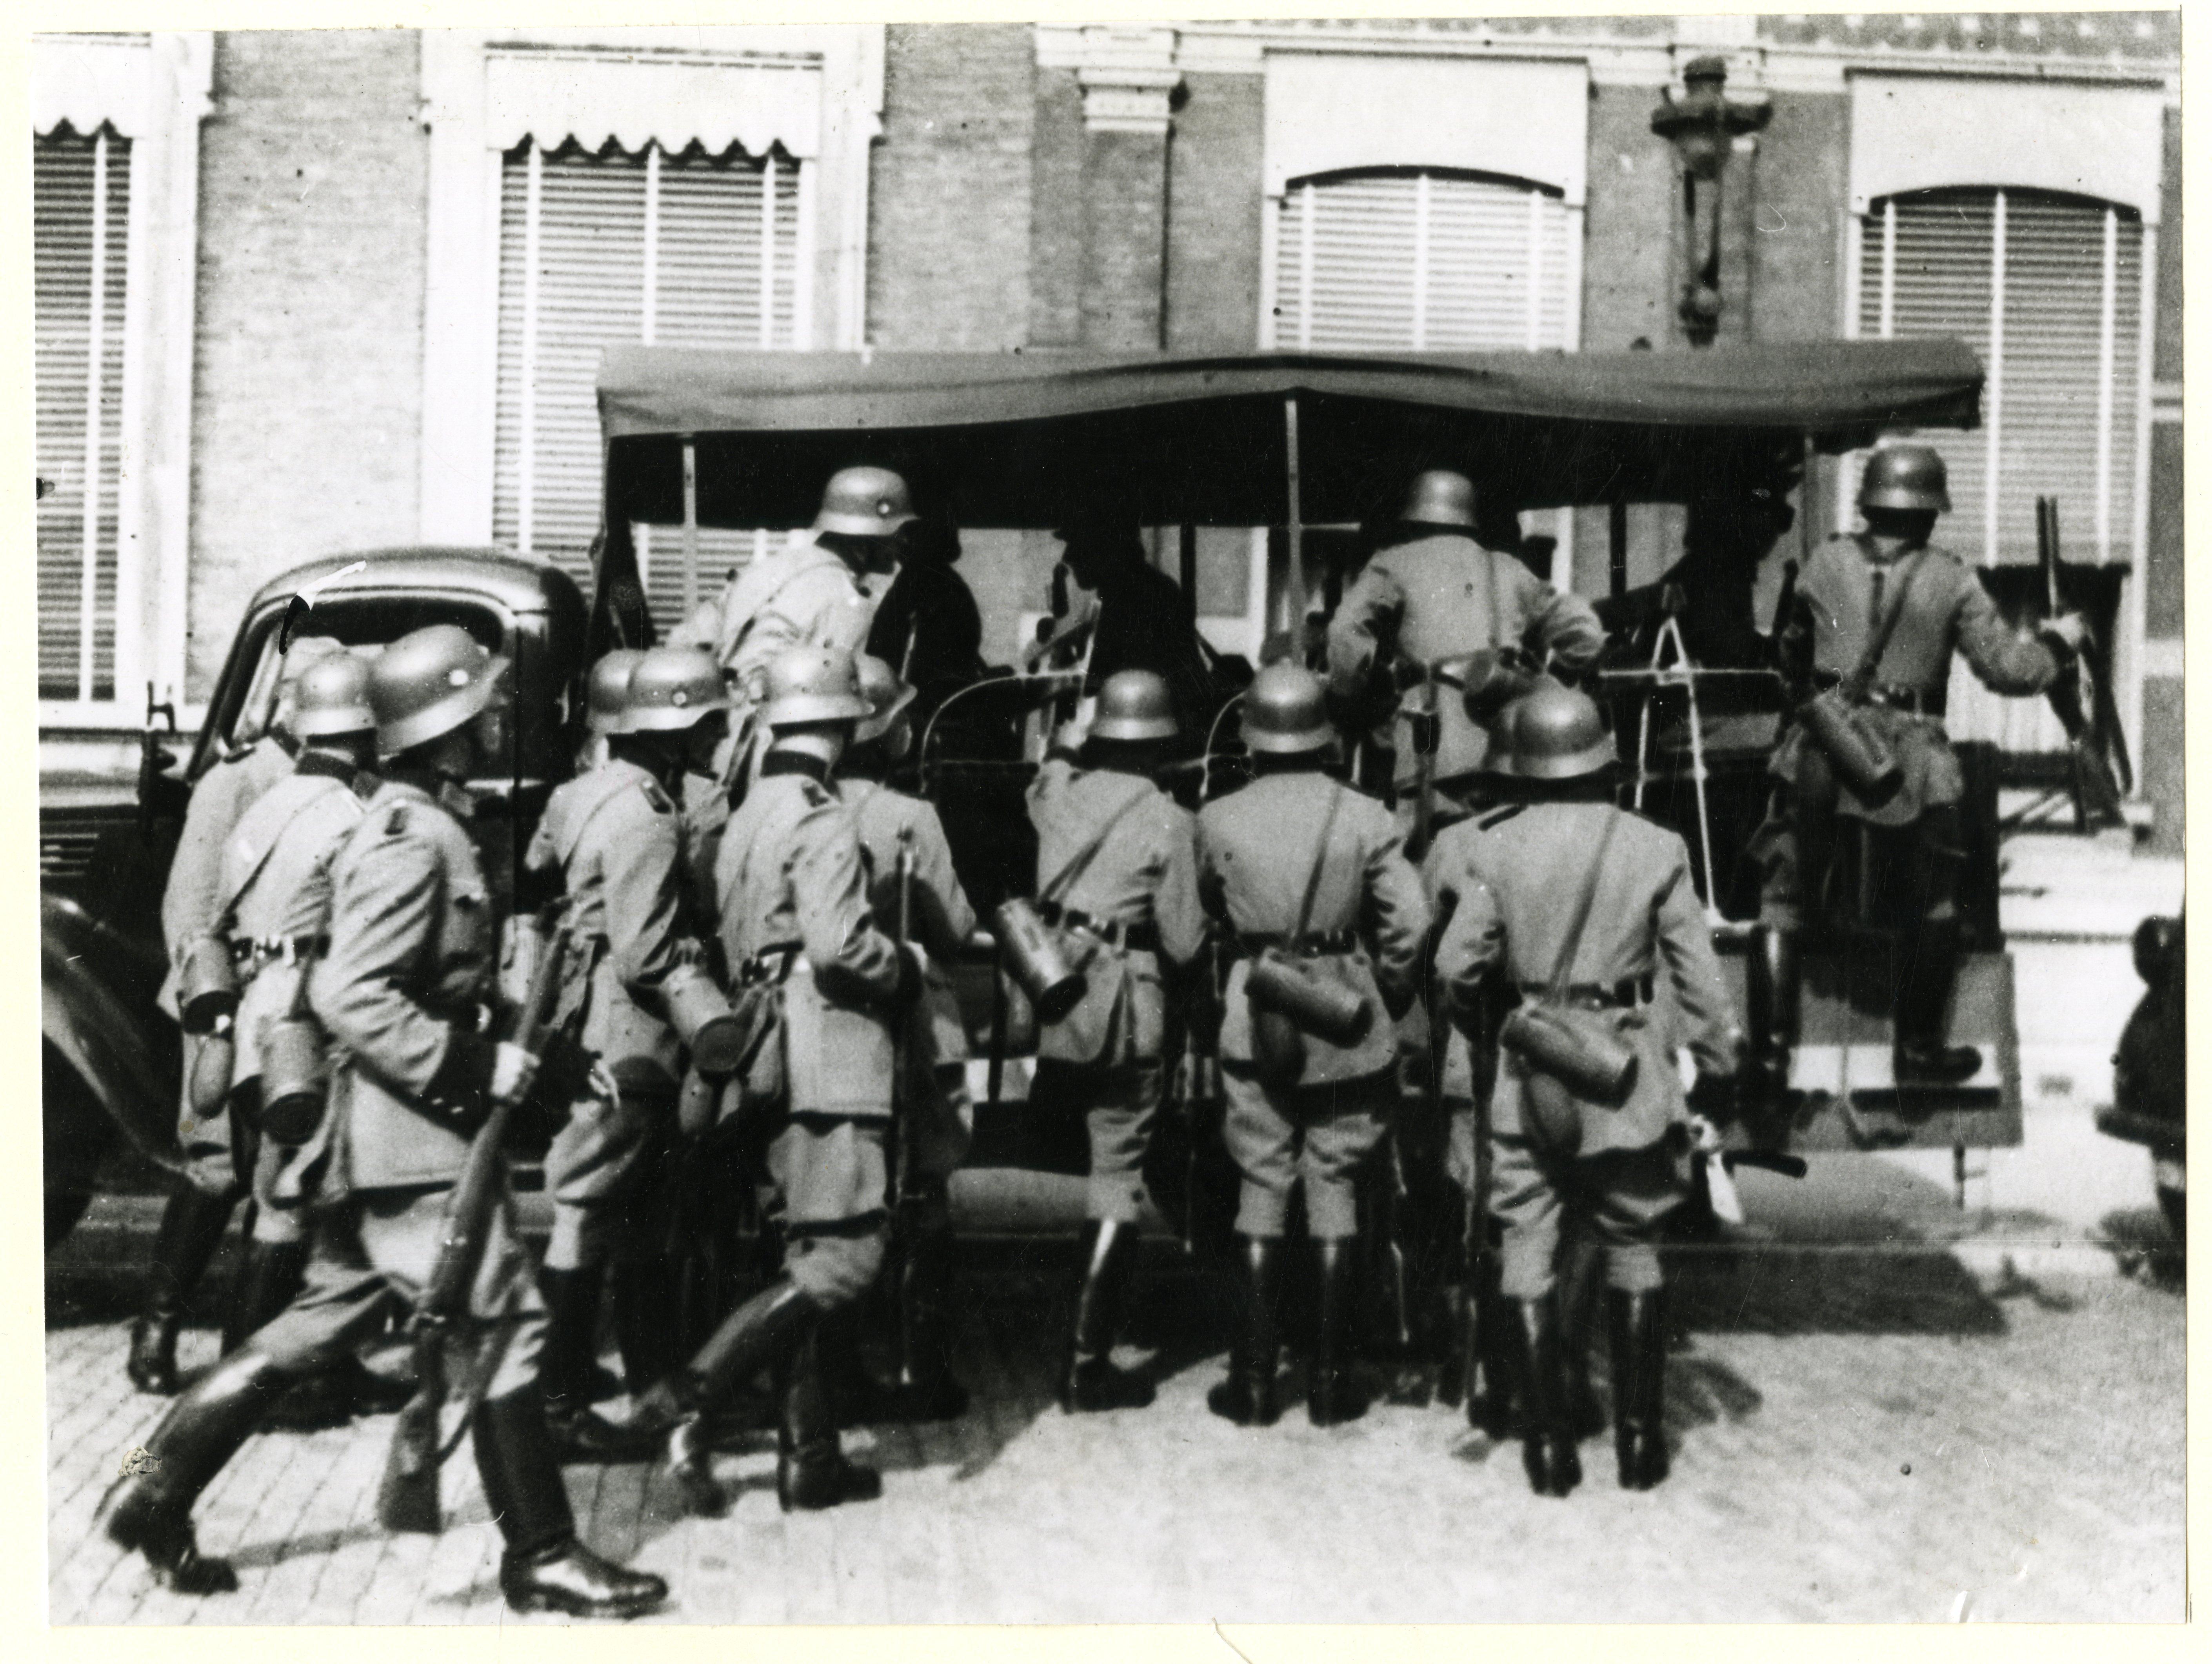 Overval van de 'Grüne Polizei' 1944.